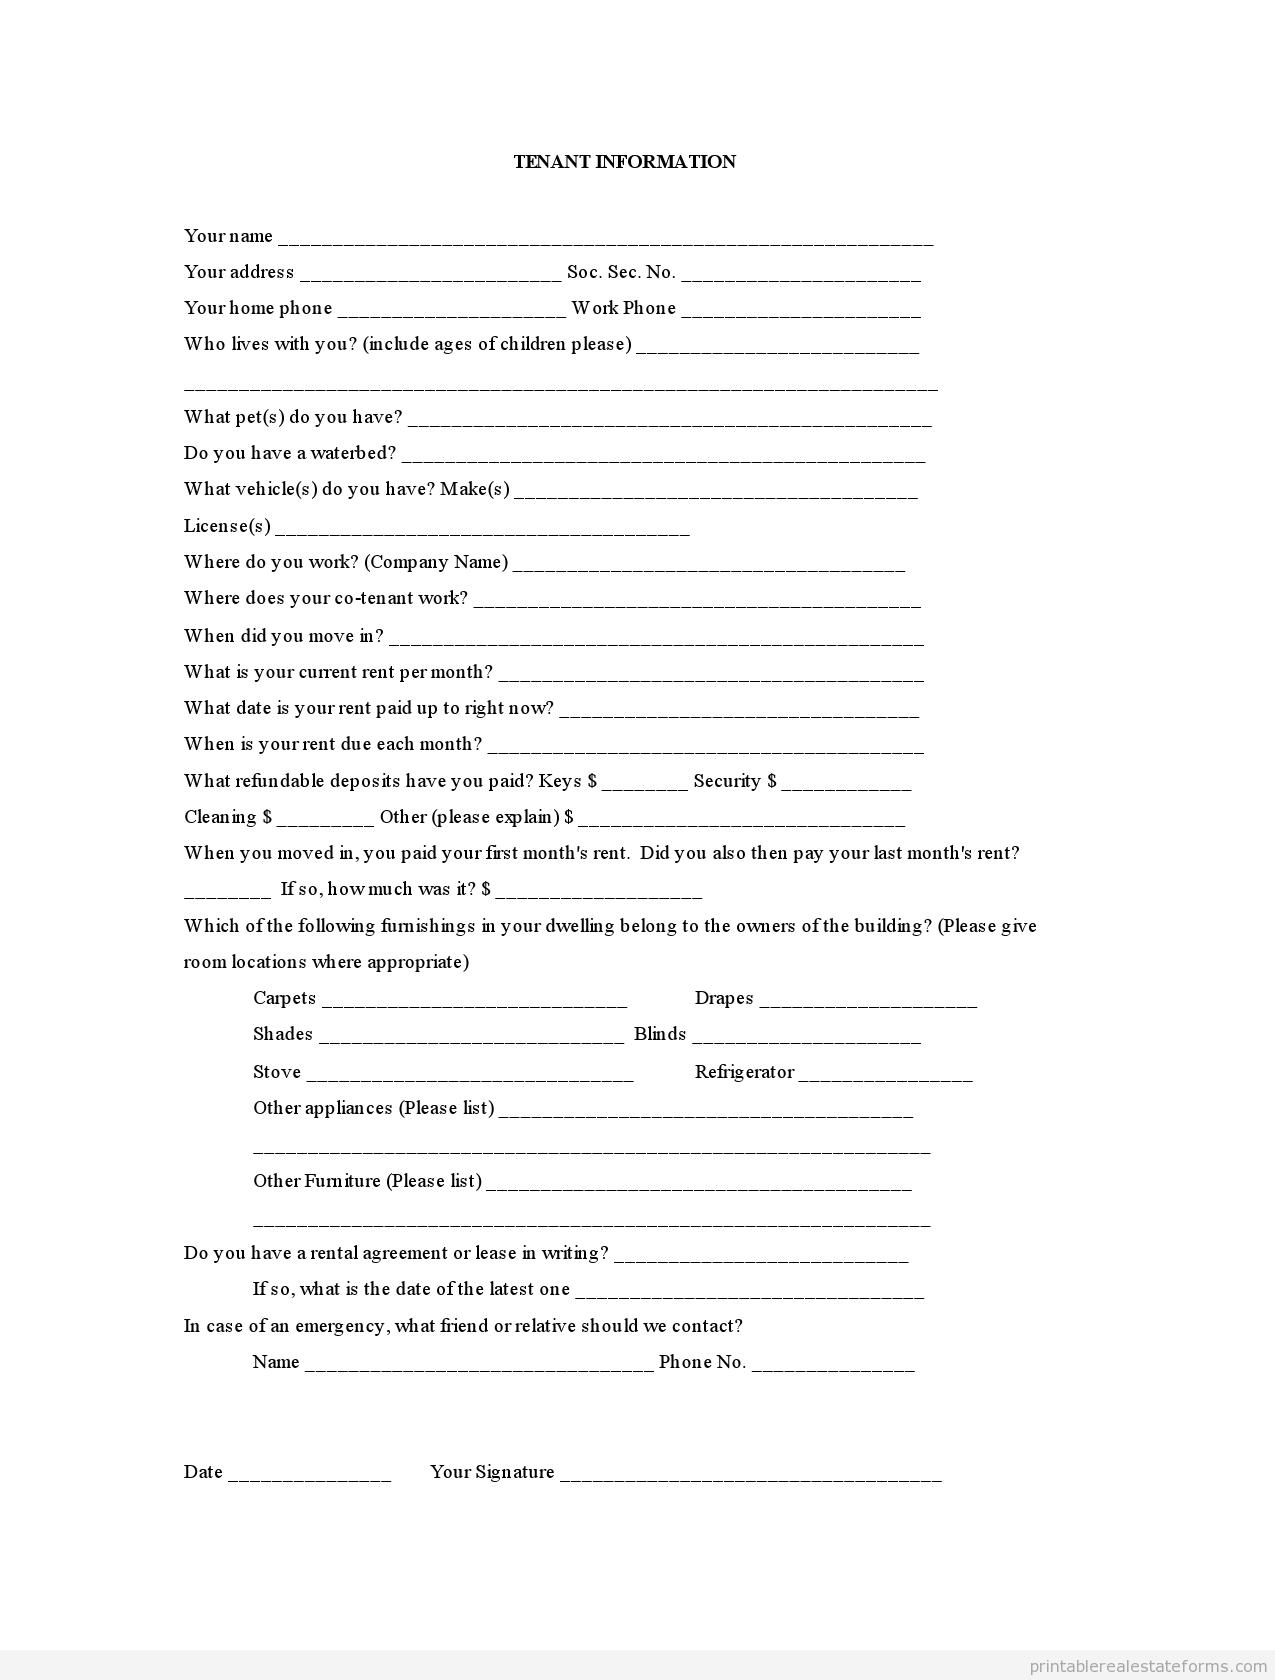 FREE Tenant Information FORM – Tenant Information Form